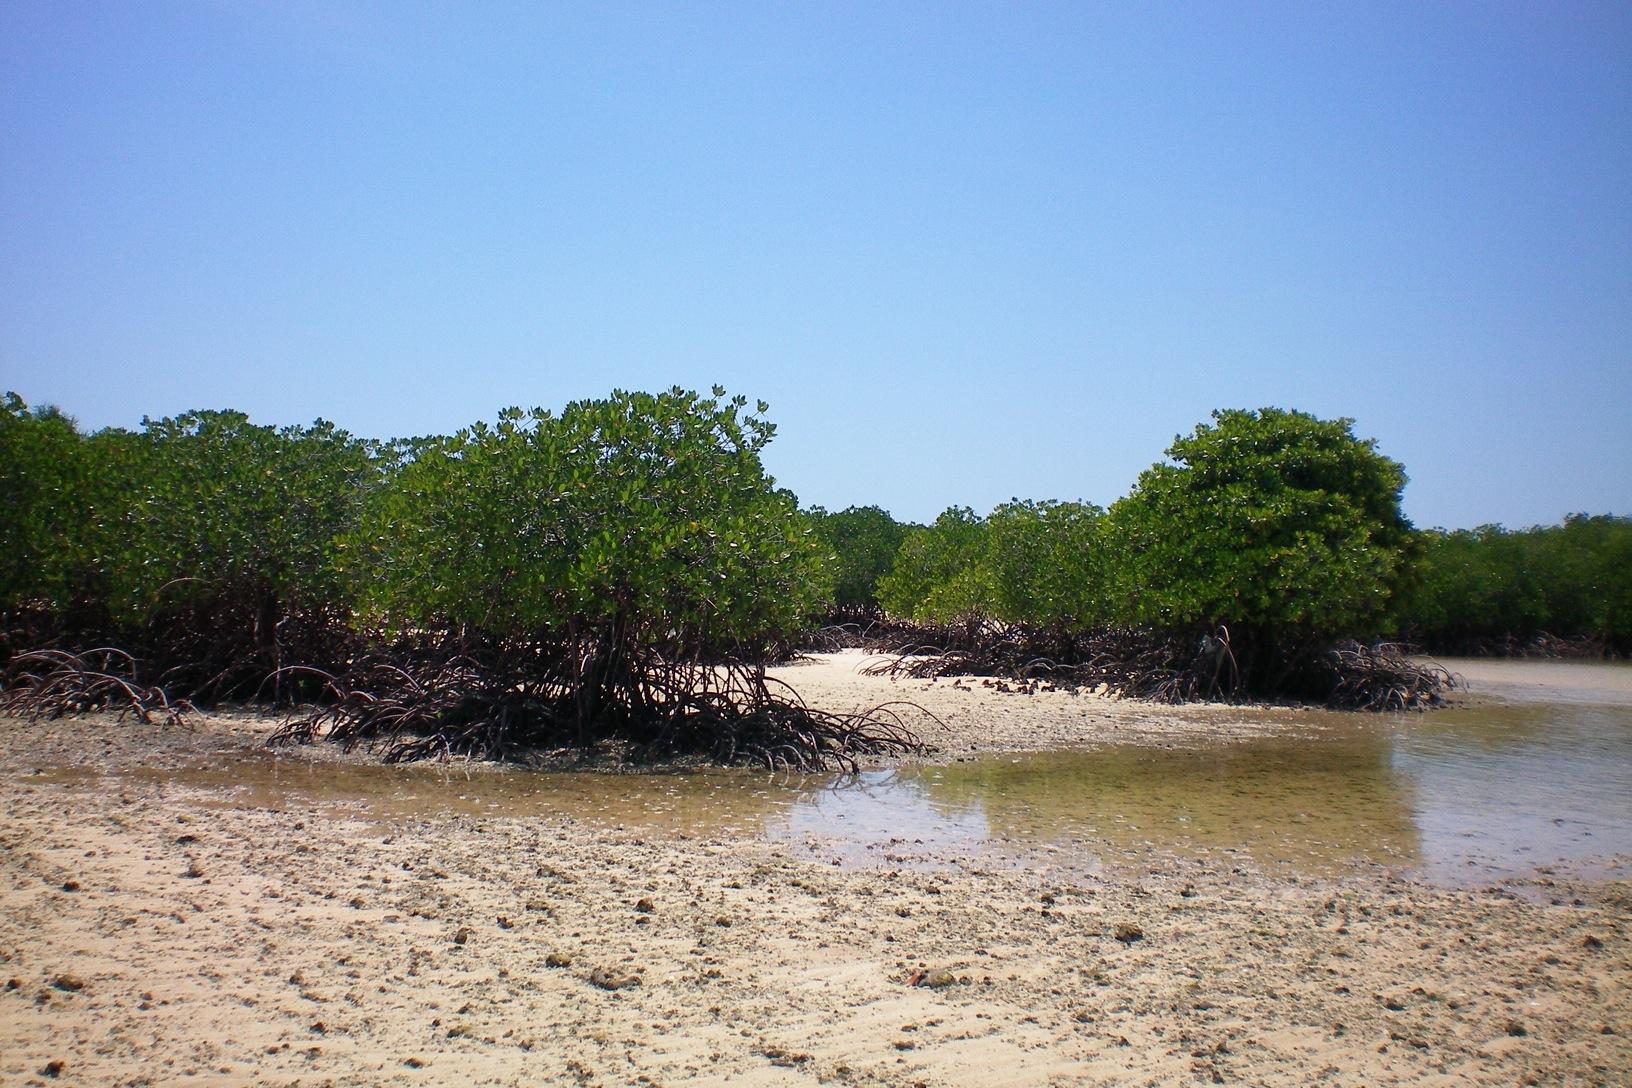 Bali Mangroven